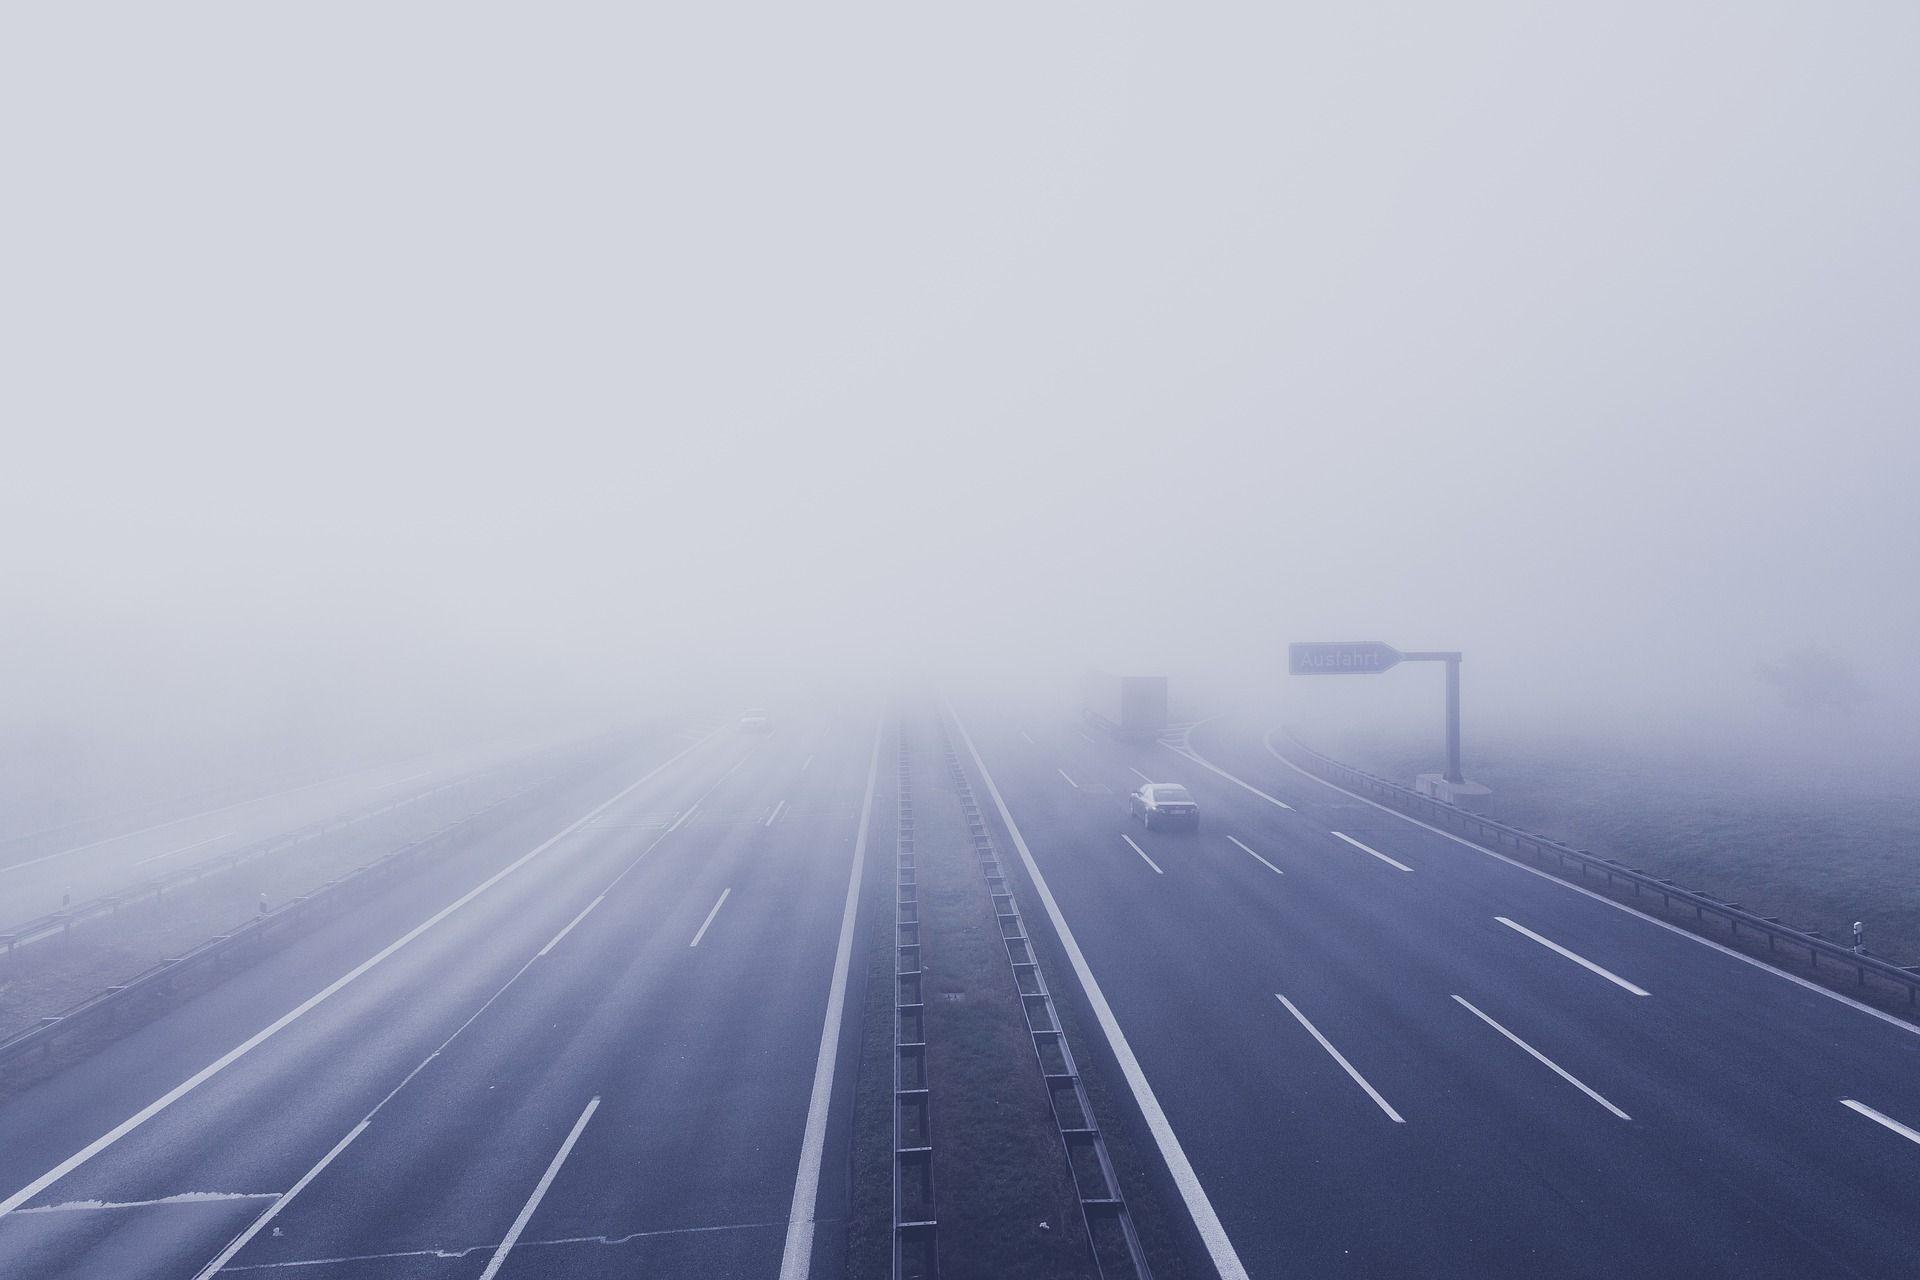 fog-1819149_1920.jpg